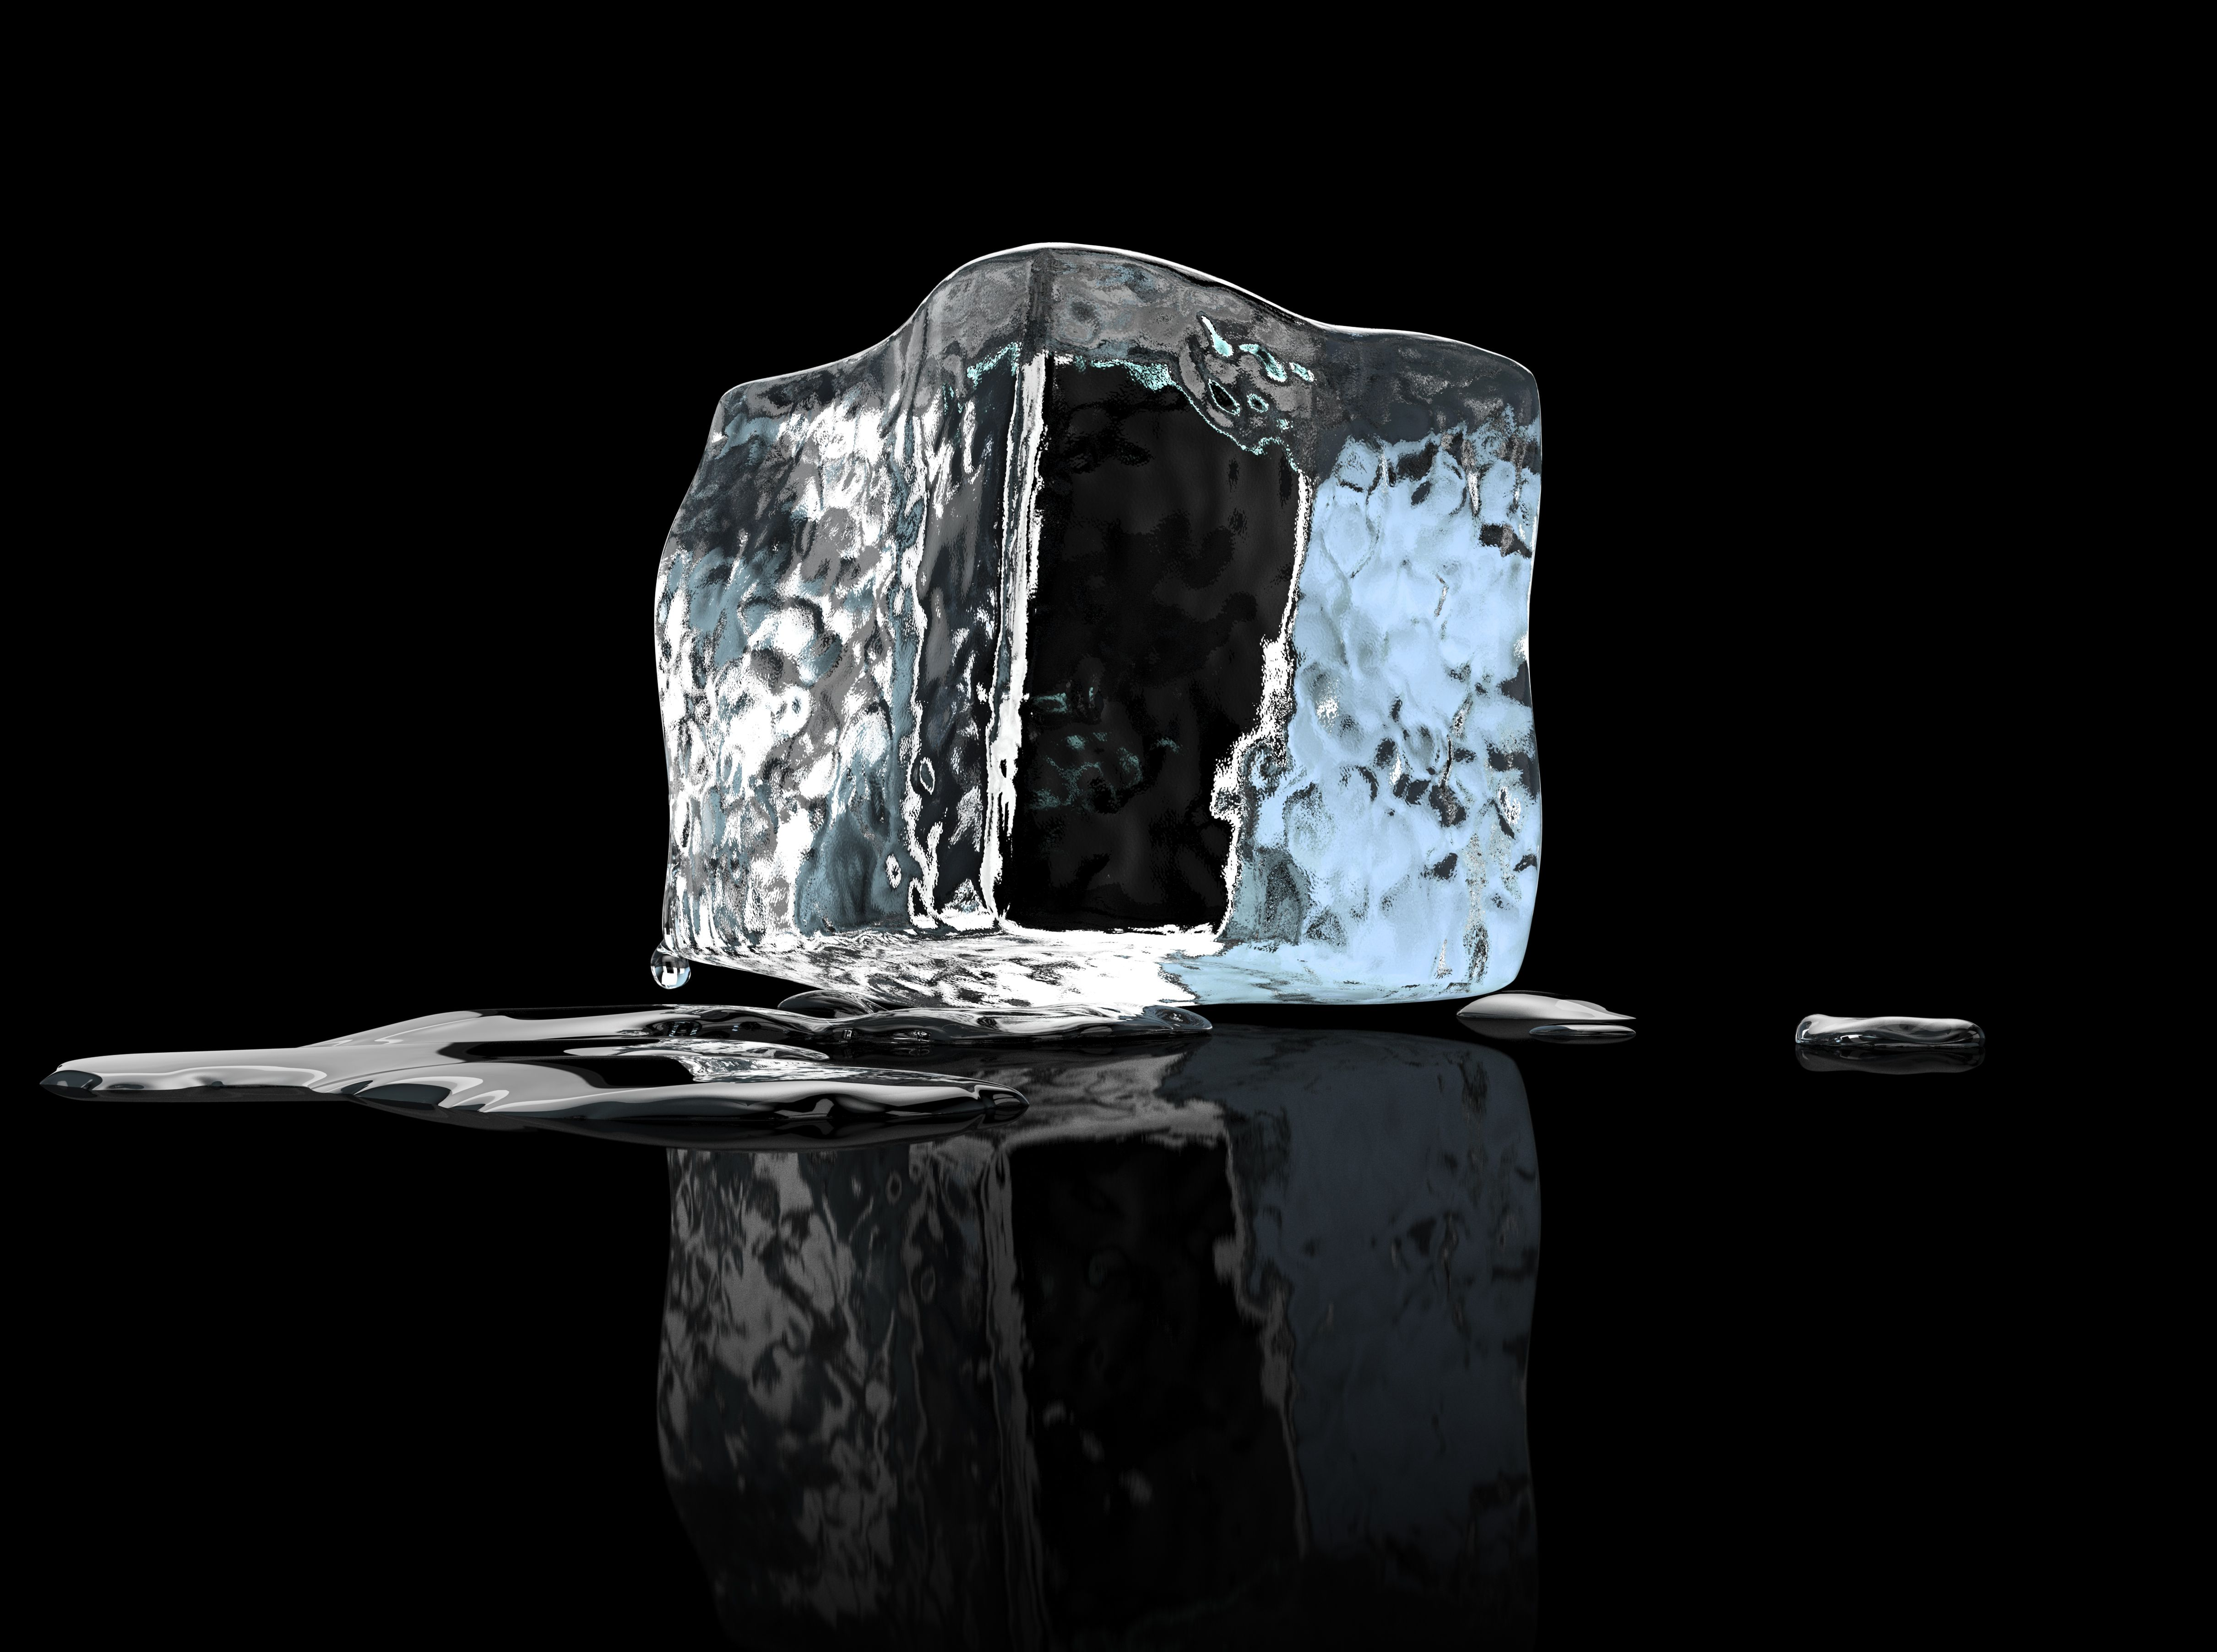 Melting Point Vs Freezing Point